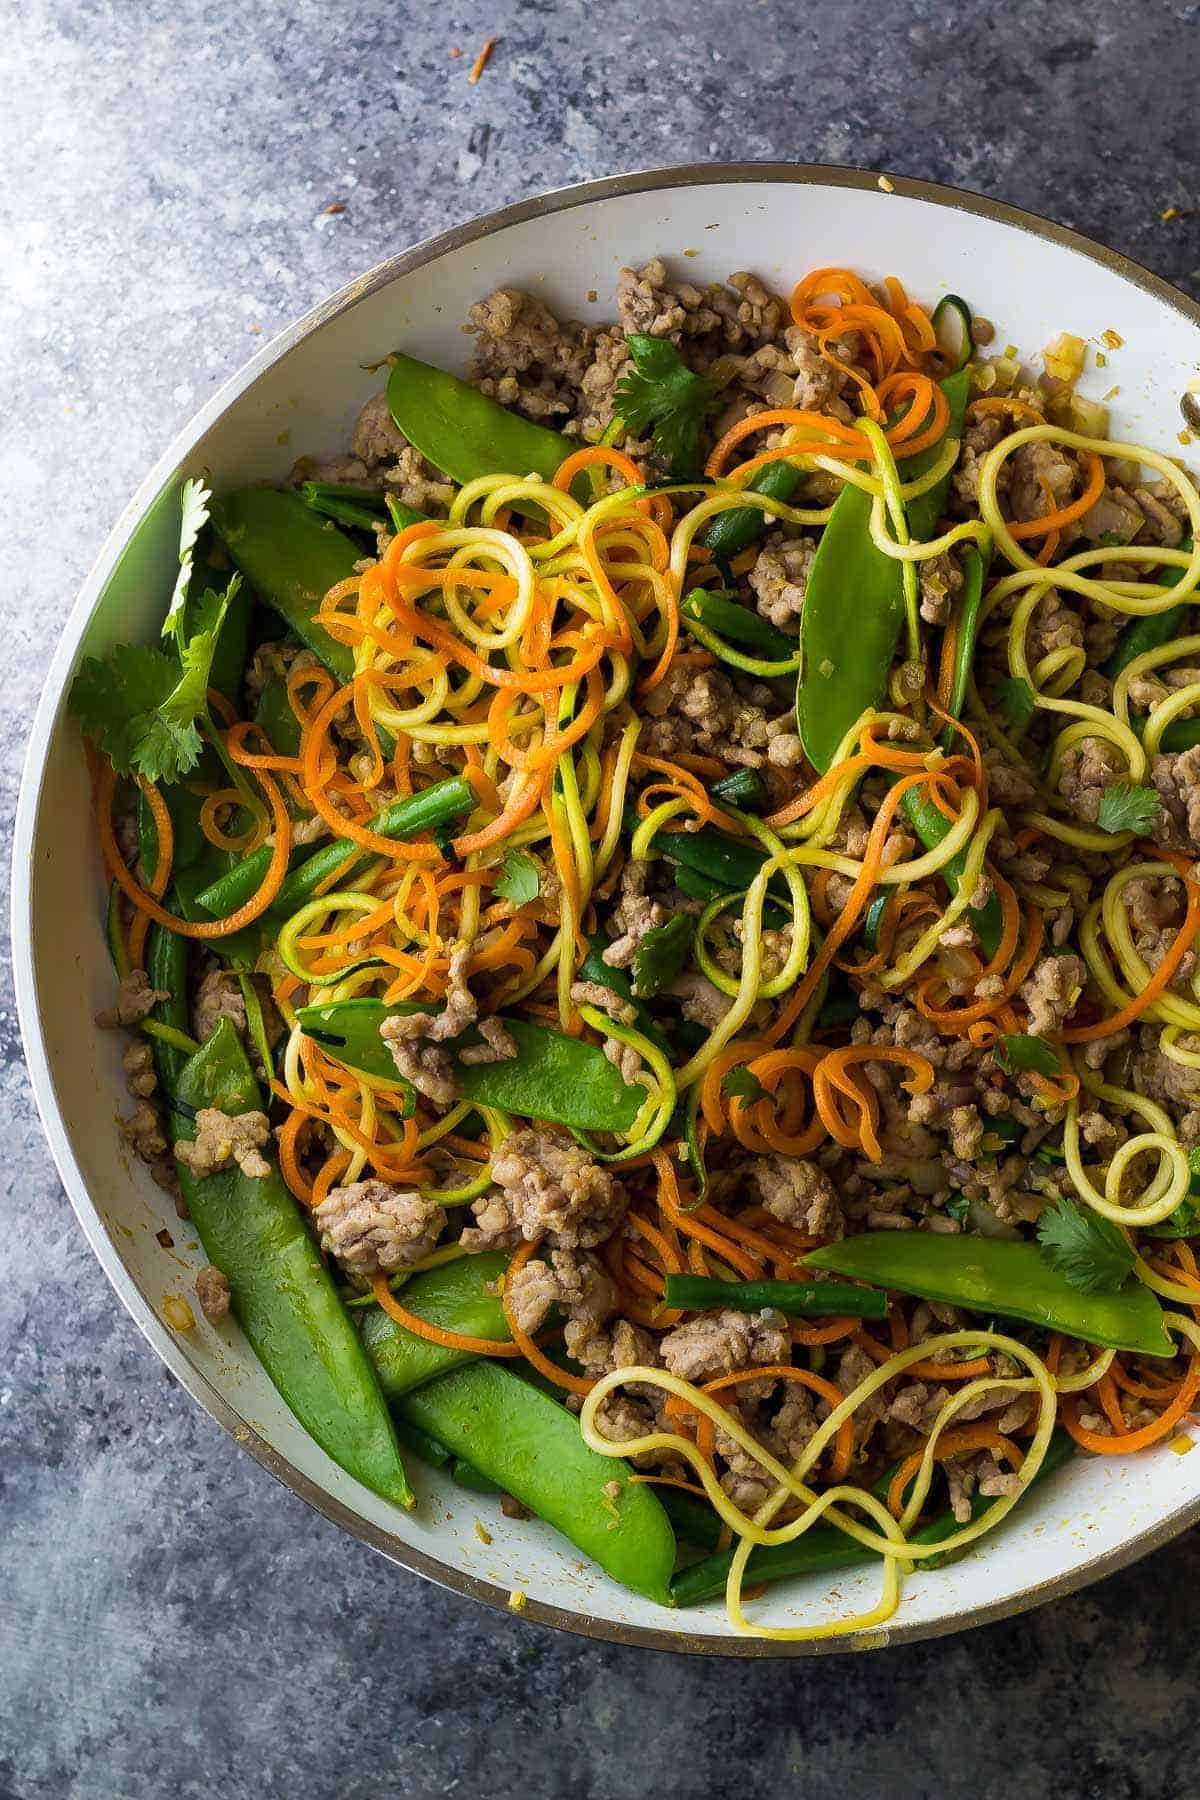 Lemongrass Thai Ground Pork Stir Fry in a skillet